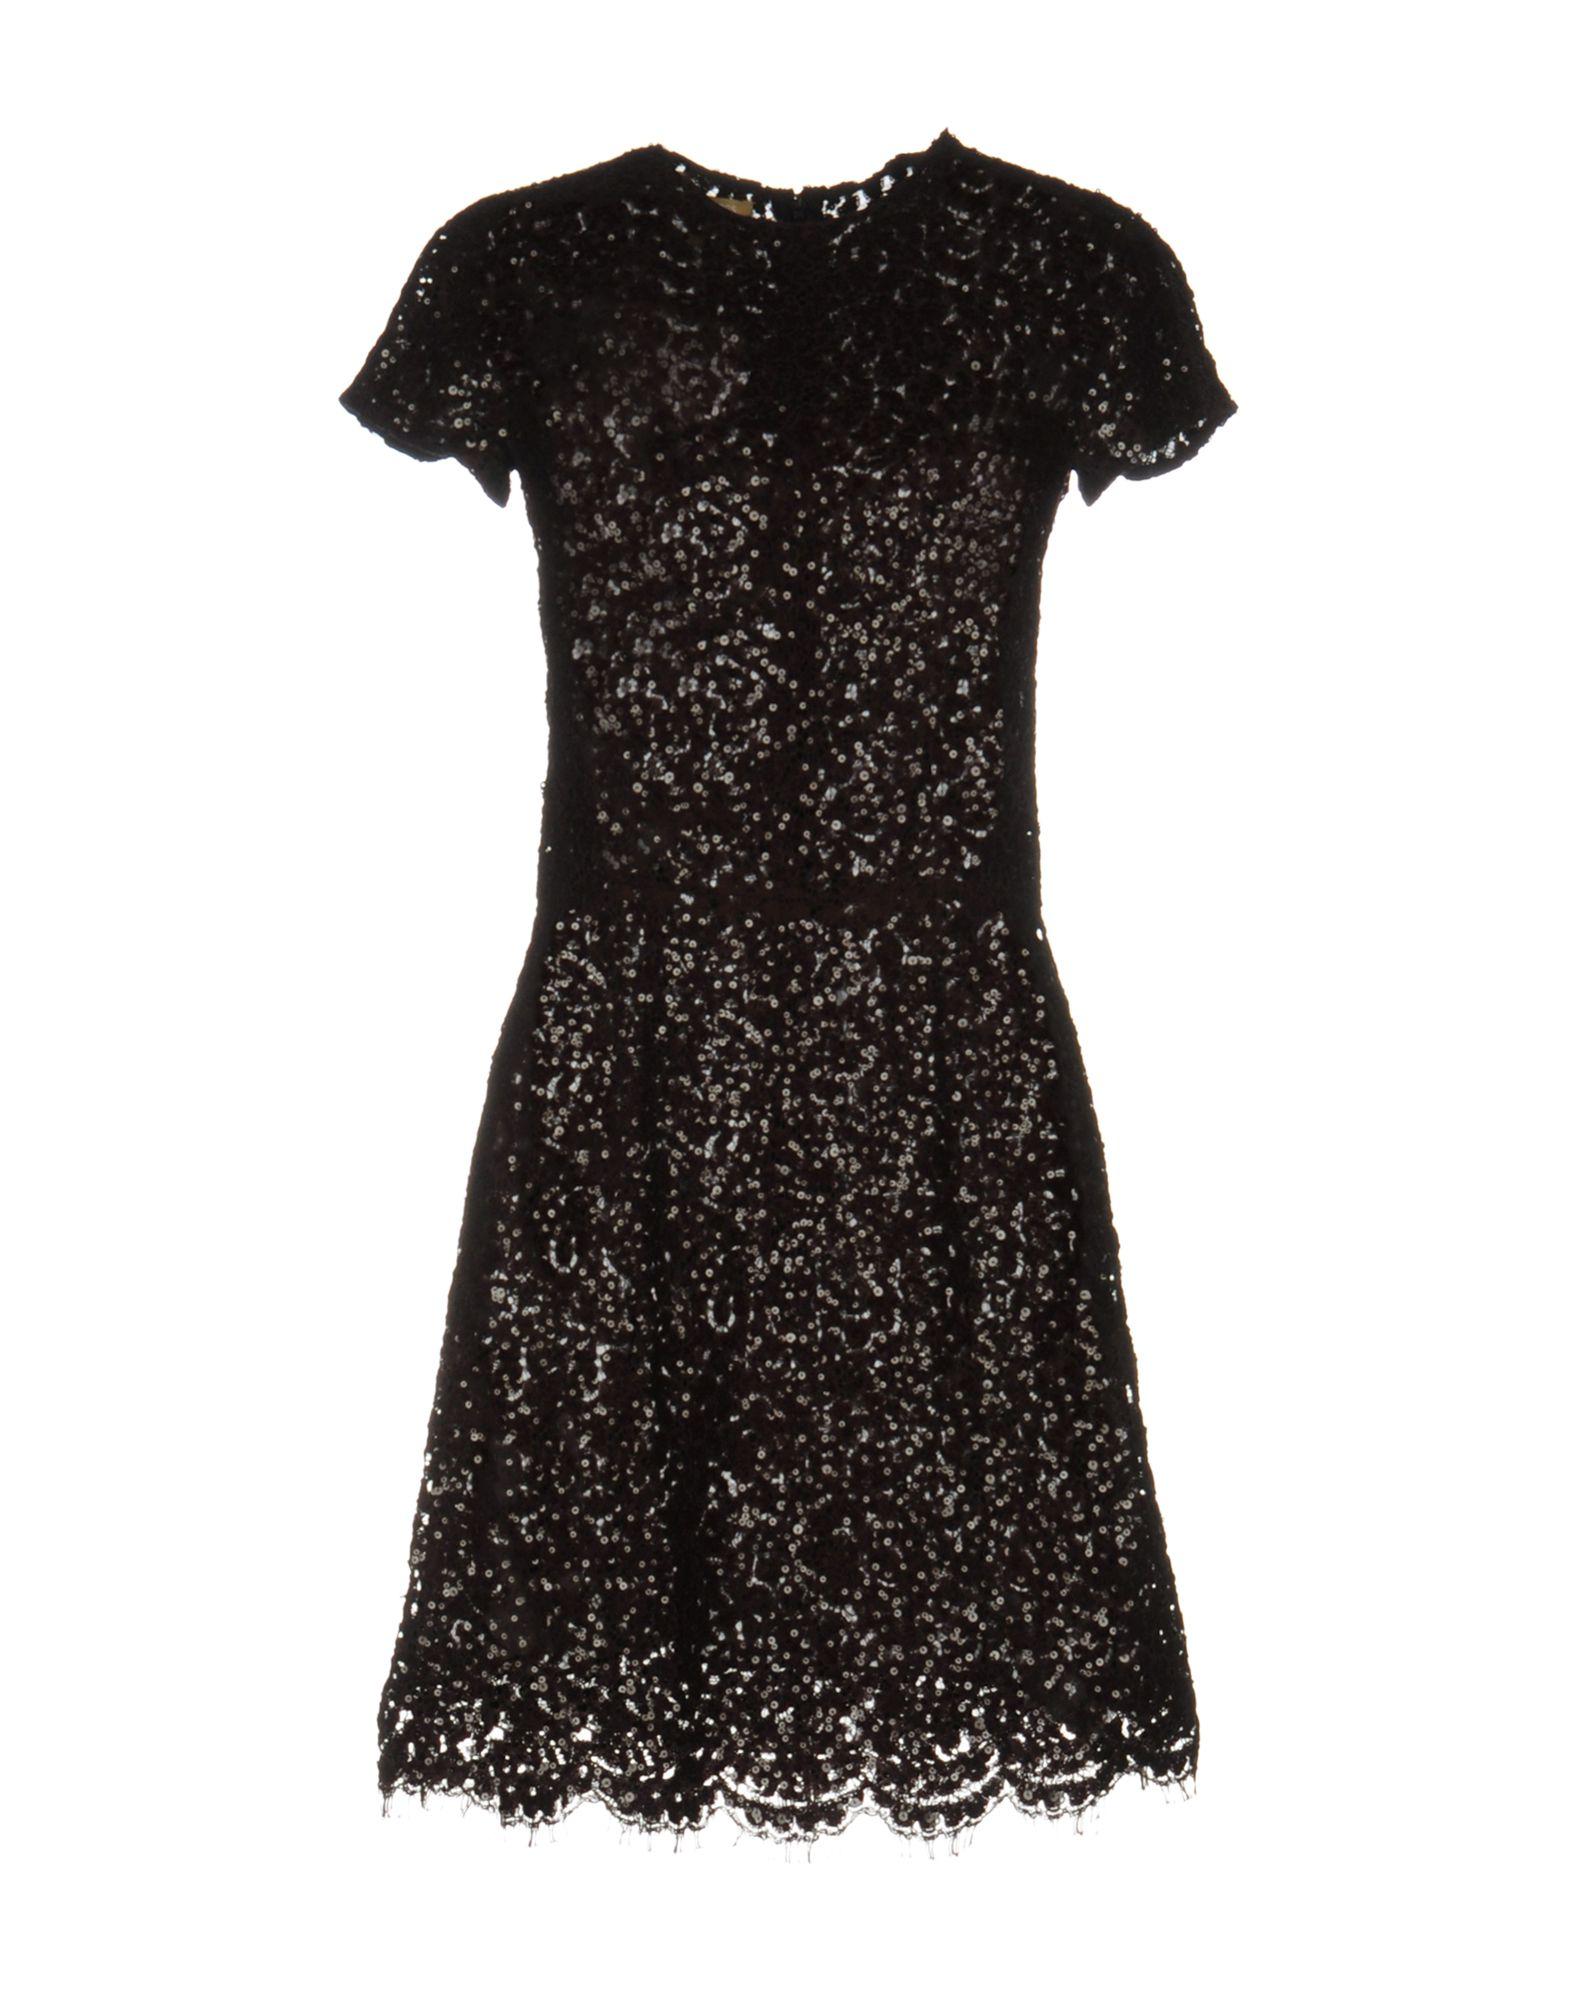 MICHAEL KORS COLLECTION Короткое платье michael kors collection сандалии byrne